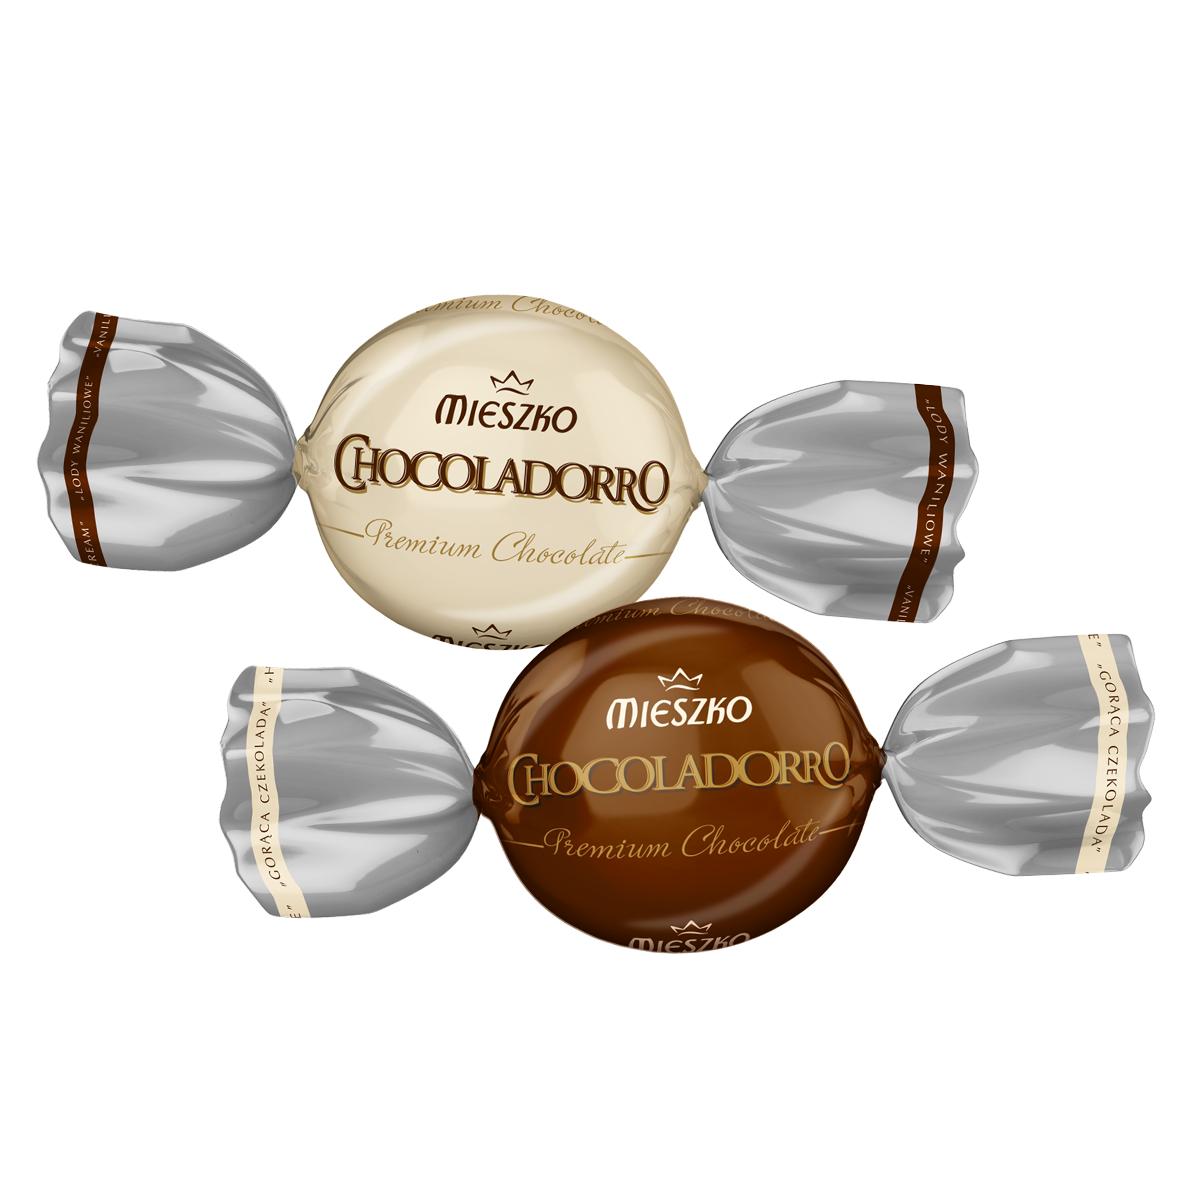 2020_09_02_chocoladorro_2